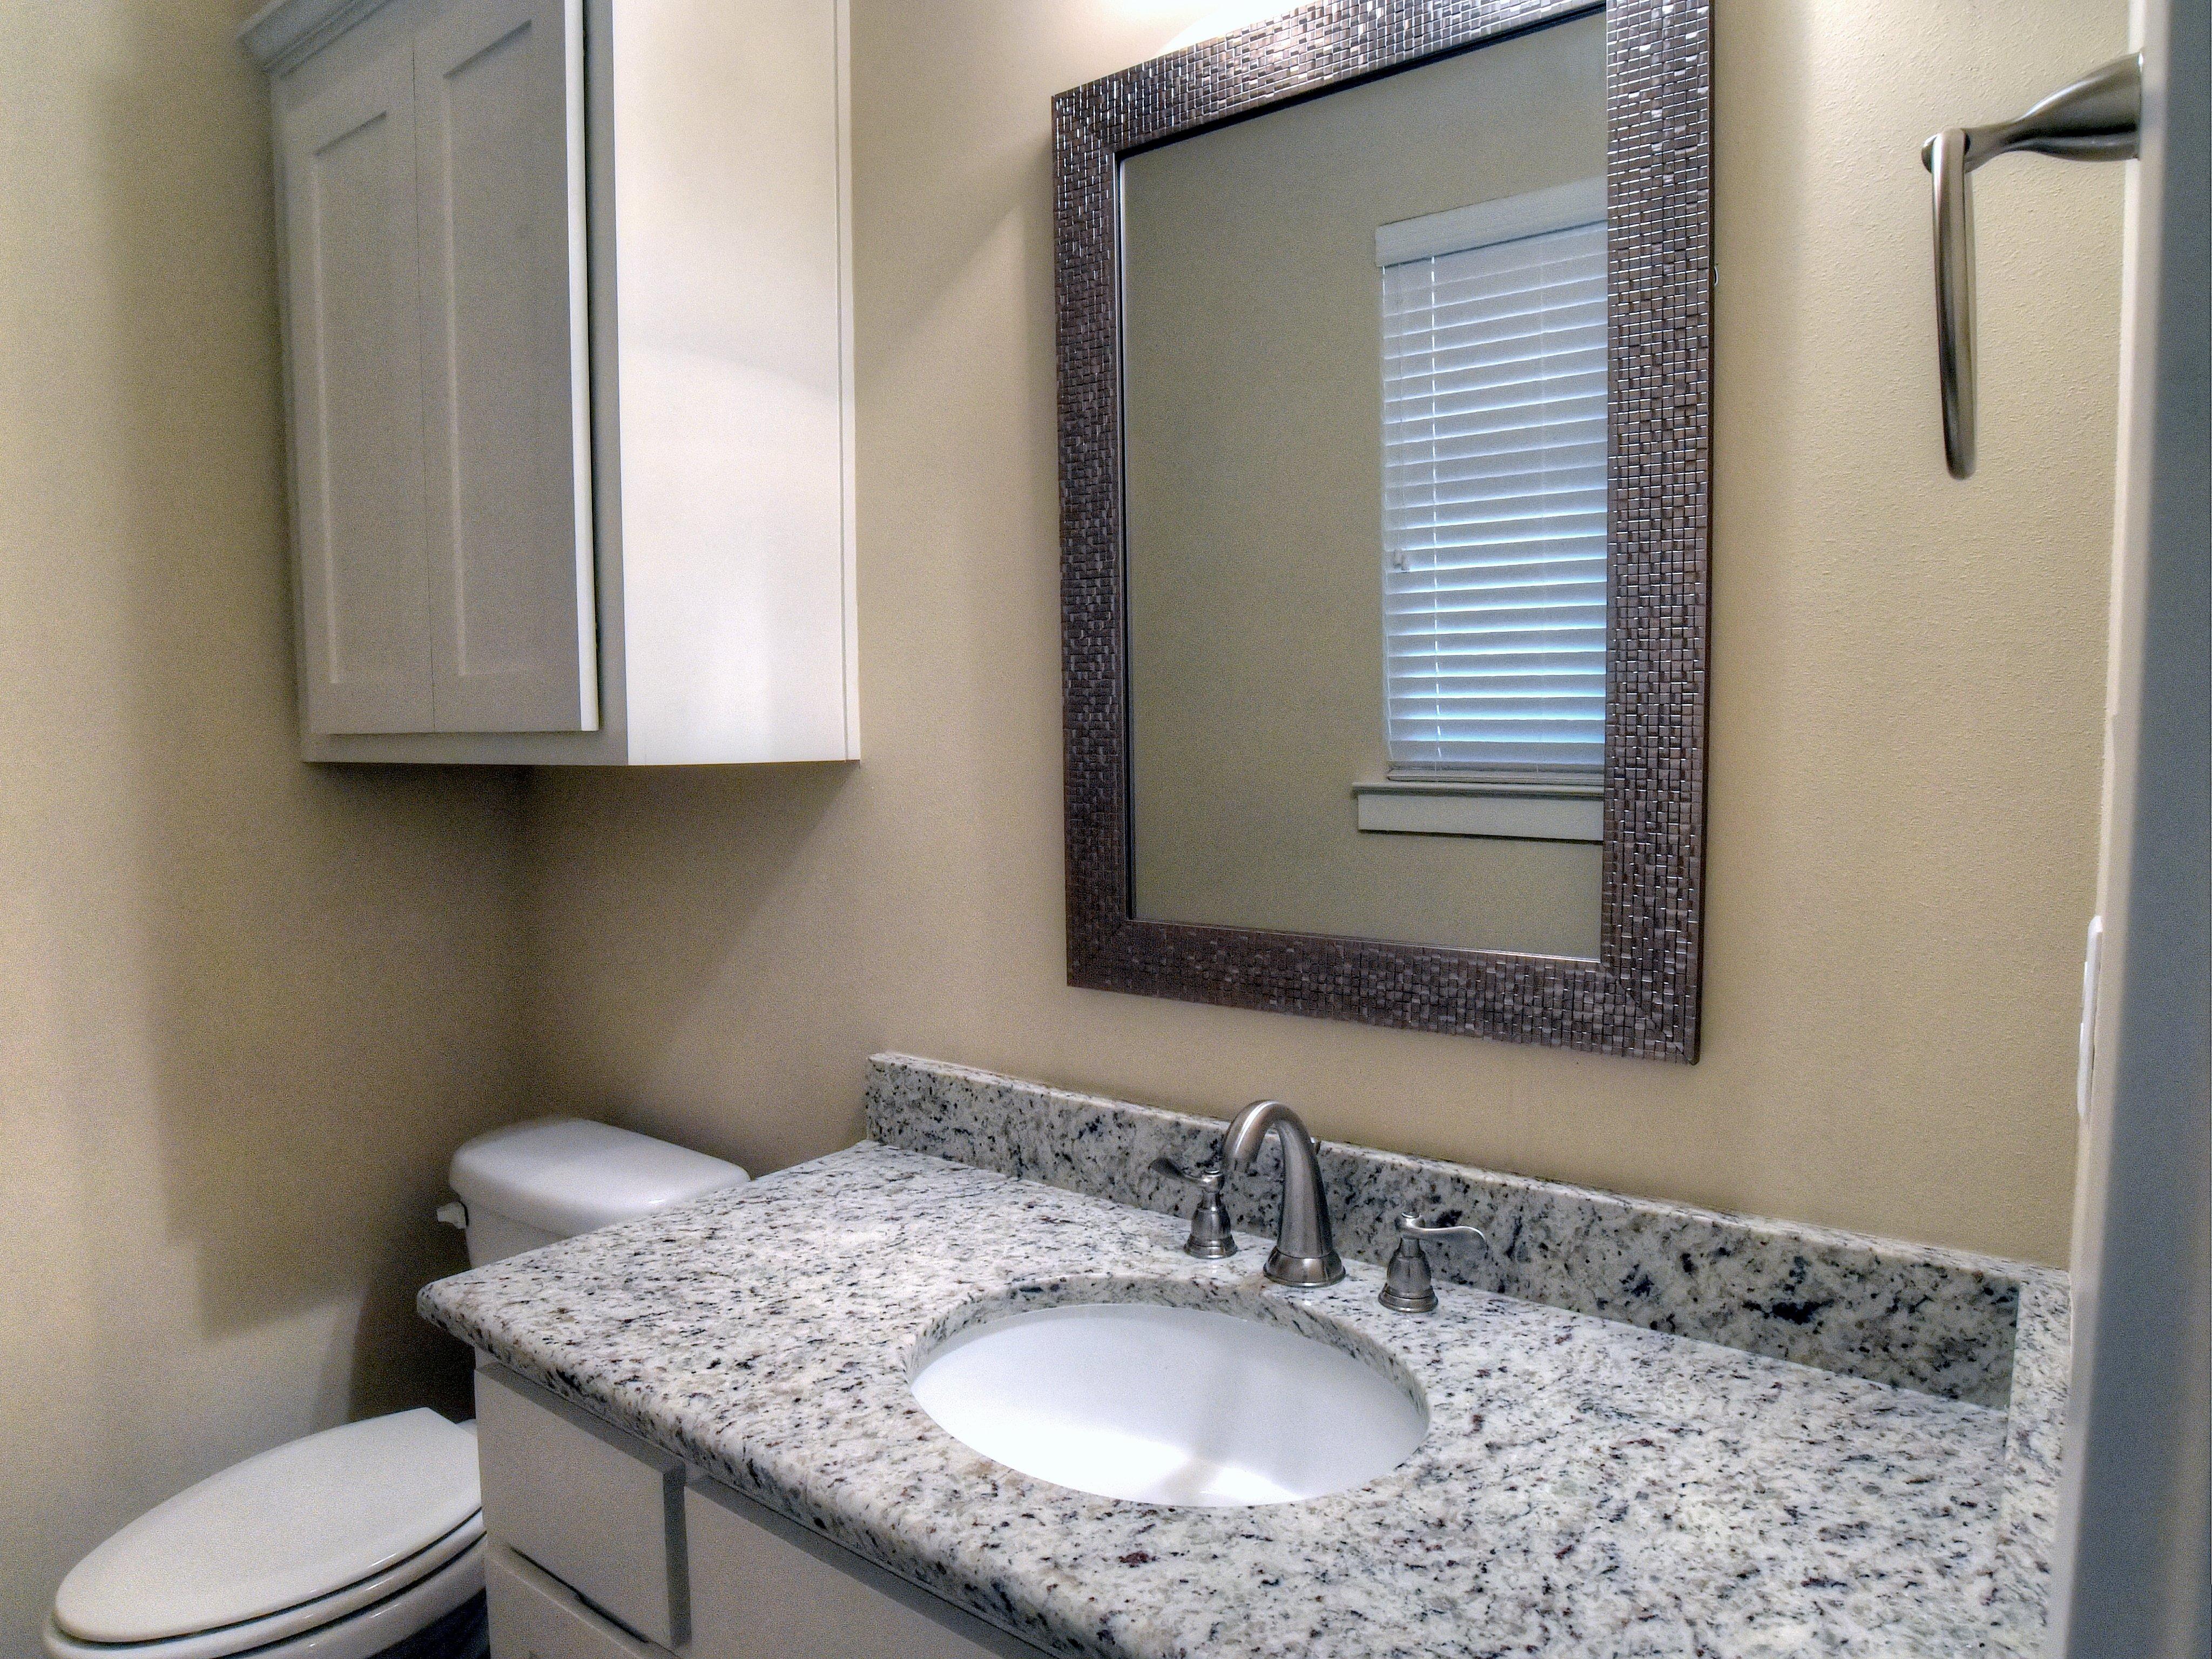 93 Beacon Point Condo rental in Sandestin Rentals ~ Cottages and Villas  in Destin Florida - #17